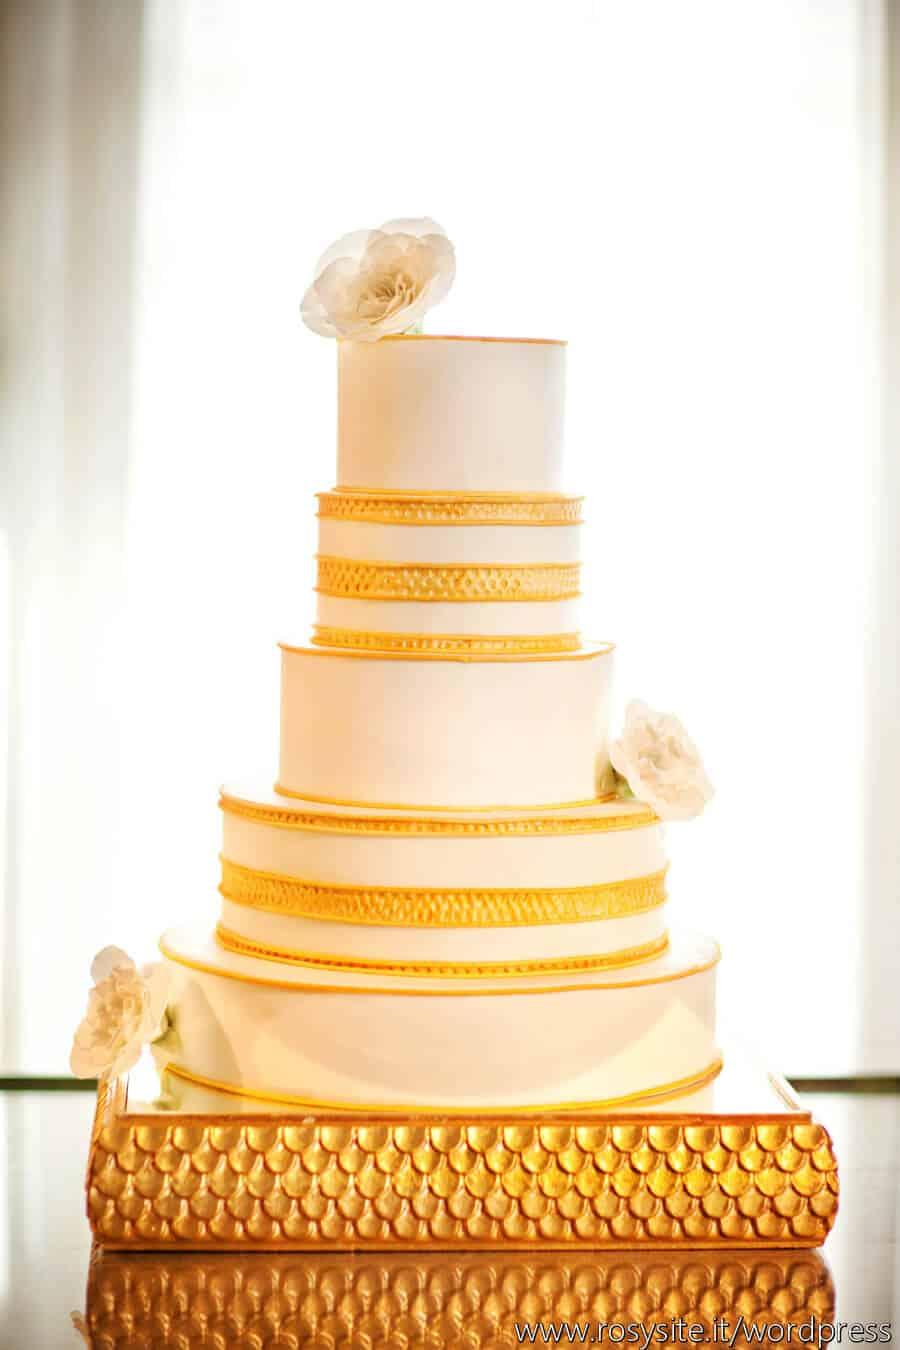 Tuscan Wedding Cakes contemporay gold cake | Tuscan Wedding Cakes